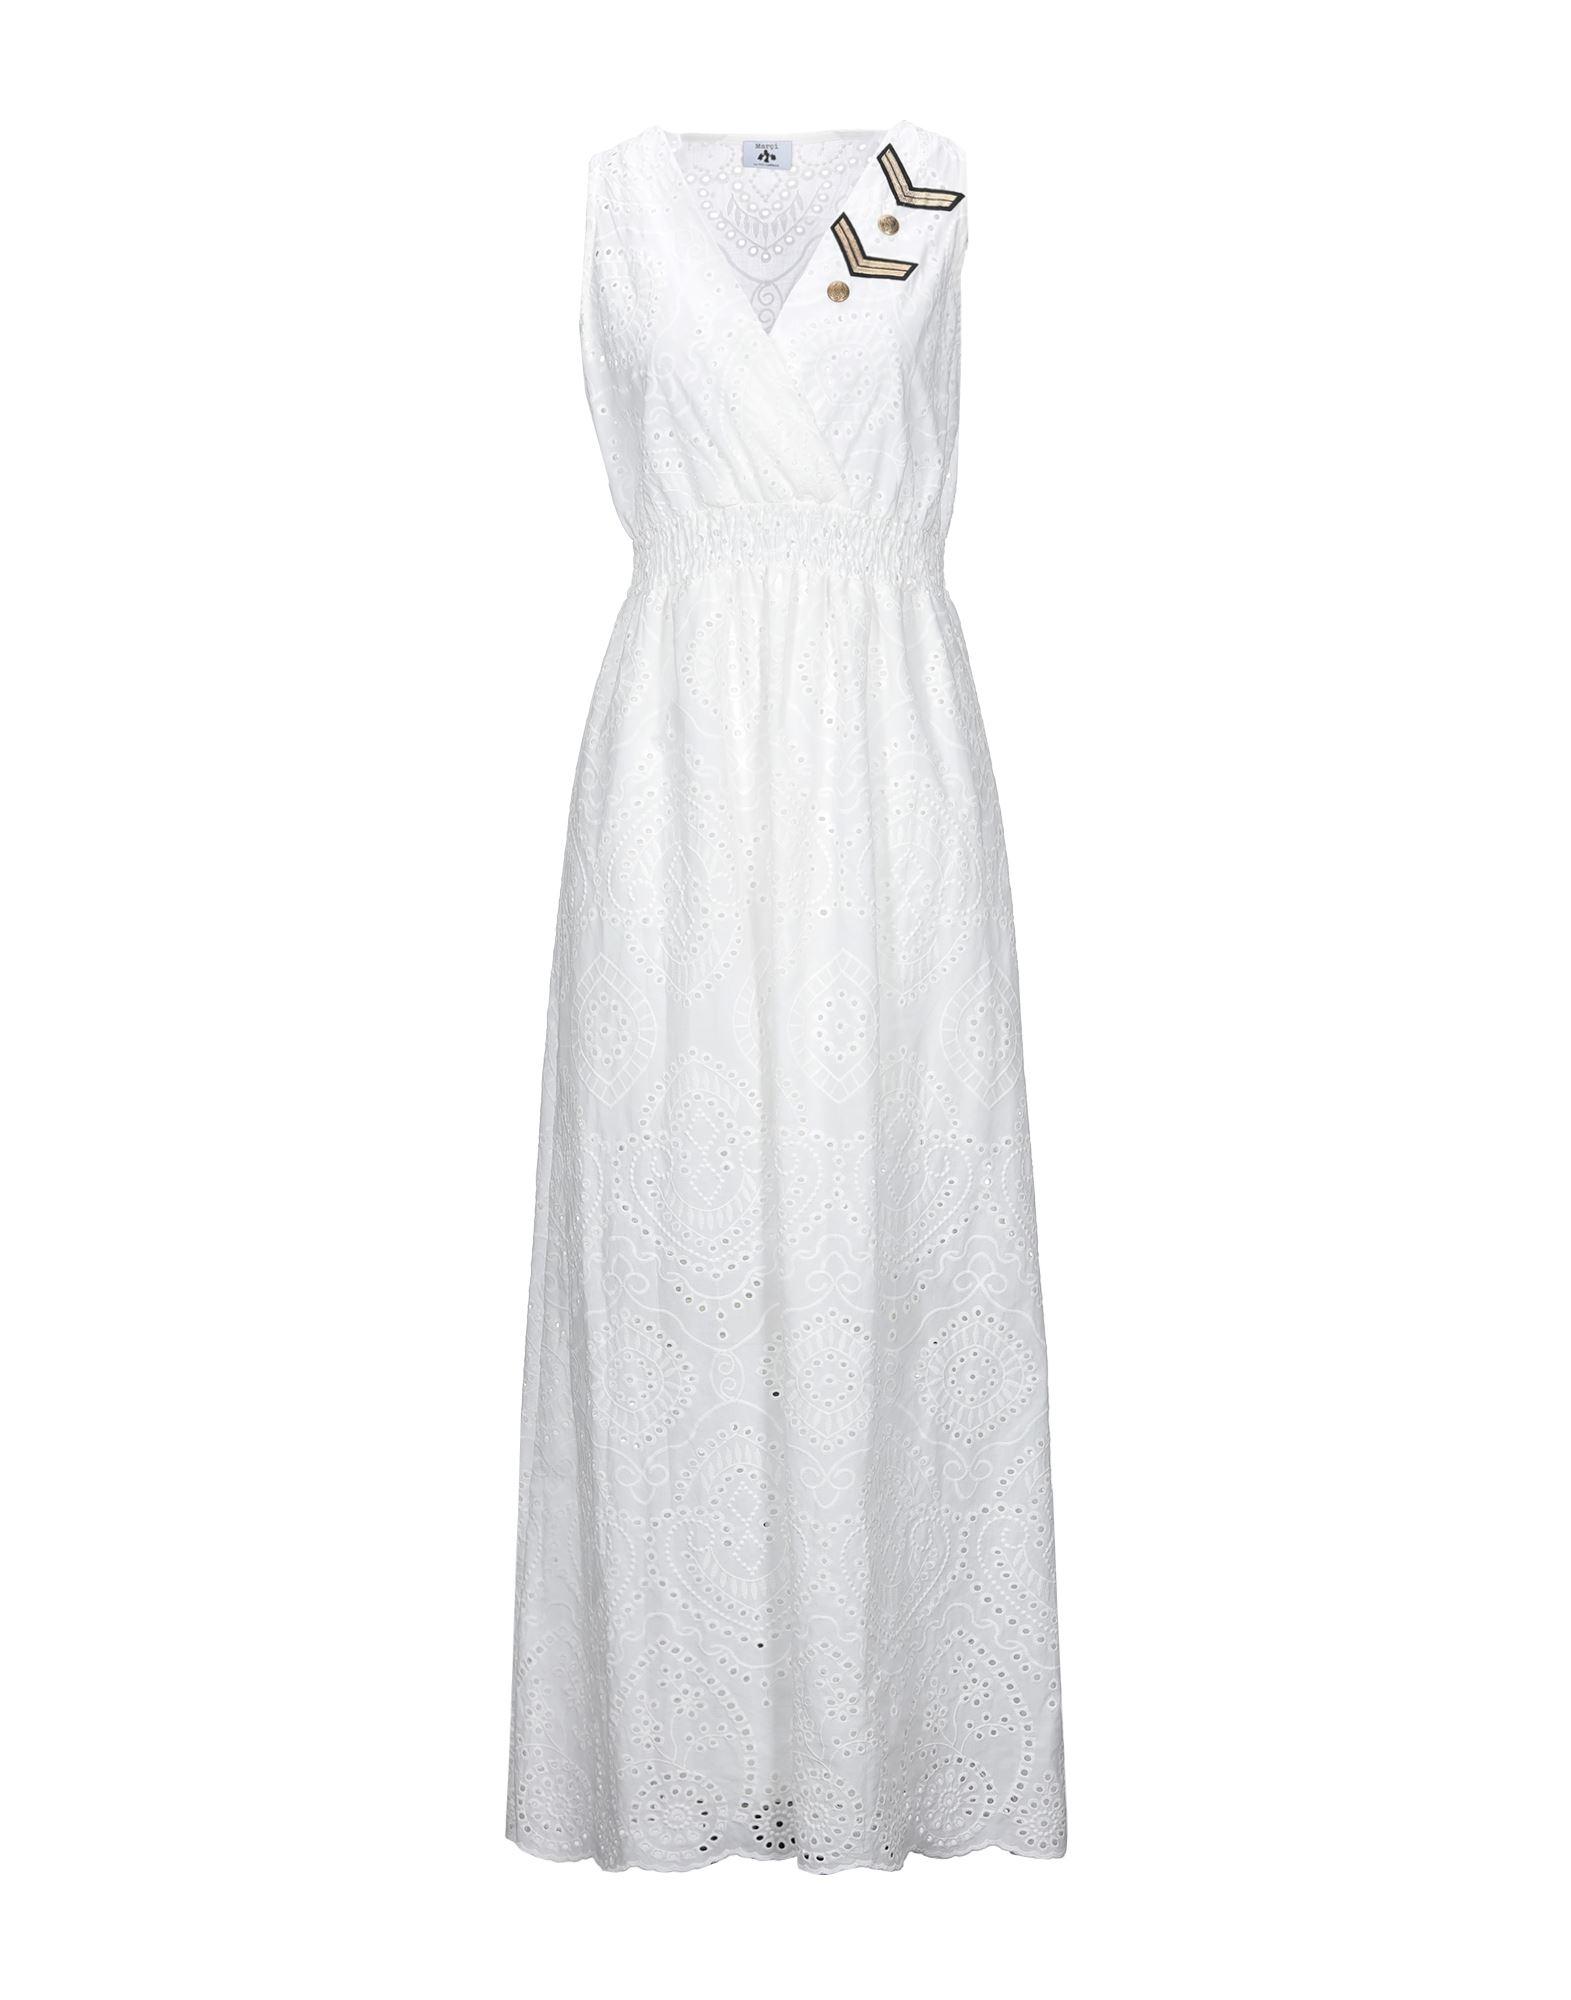 Фото - MARÇI by GIL SANTUCCI Длинное платье gil santucci платье до колена